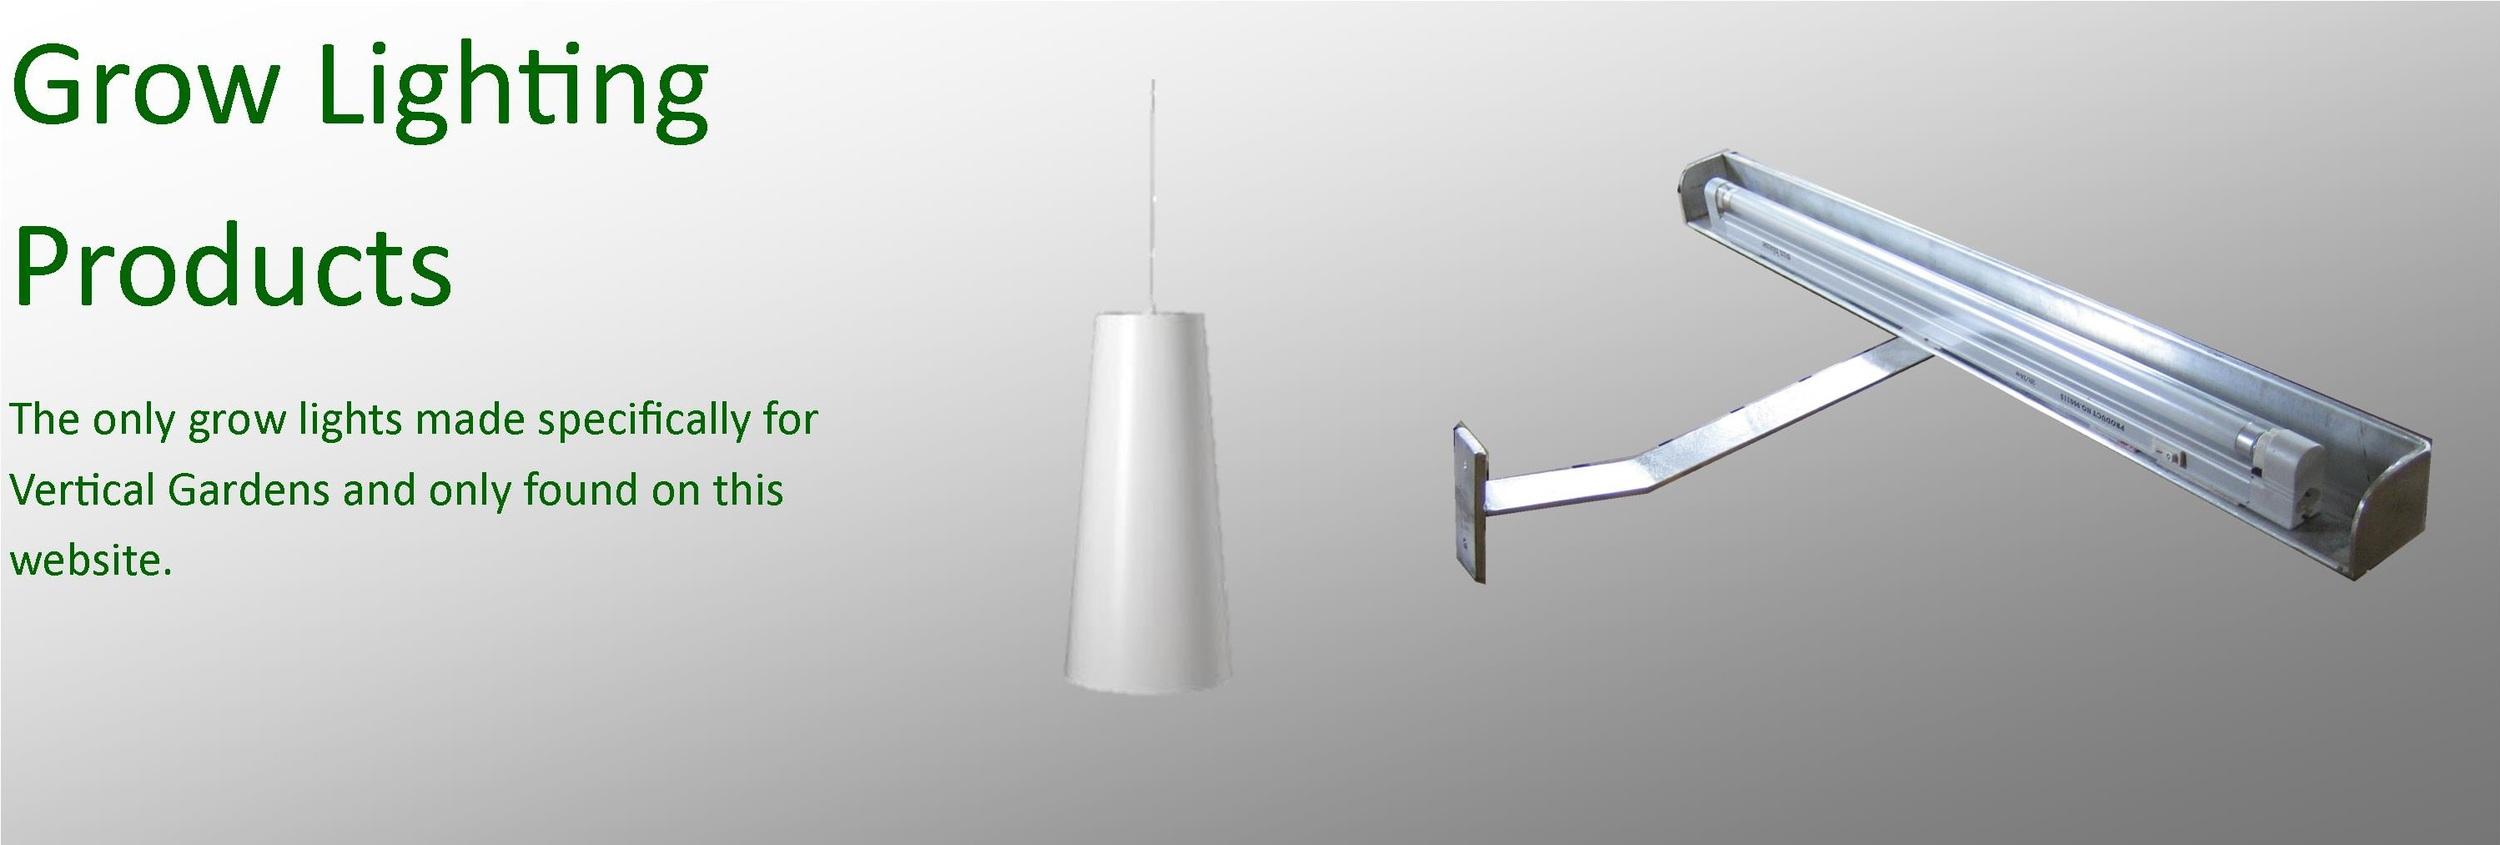 Grow Light Systems For Vertical Gardens